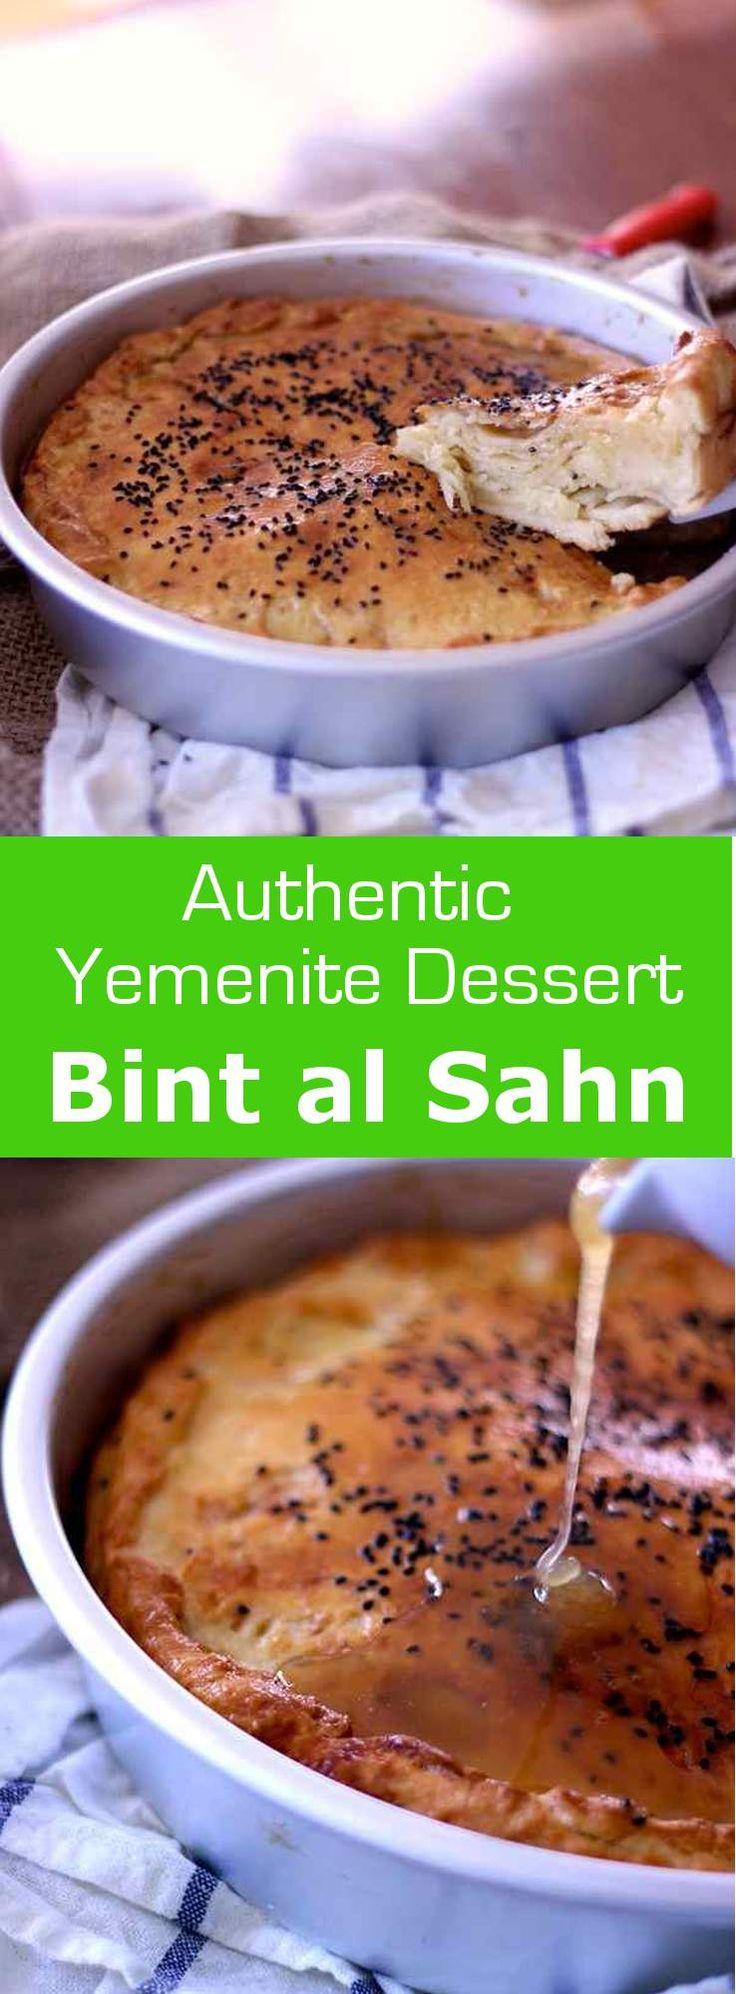 Bint al sahn is a traditional Yemenite cake that is deliciously covered with honey. #Yemen #dessert #vegetarian